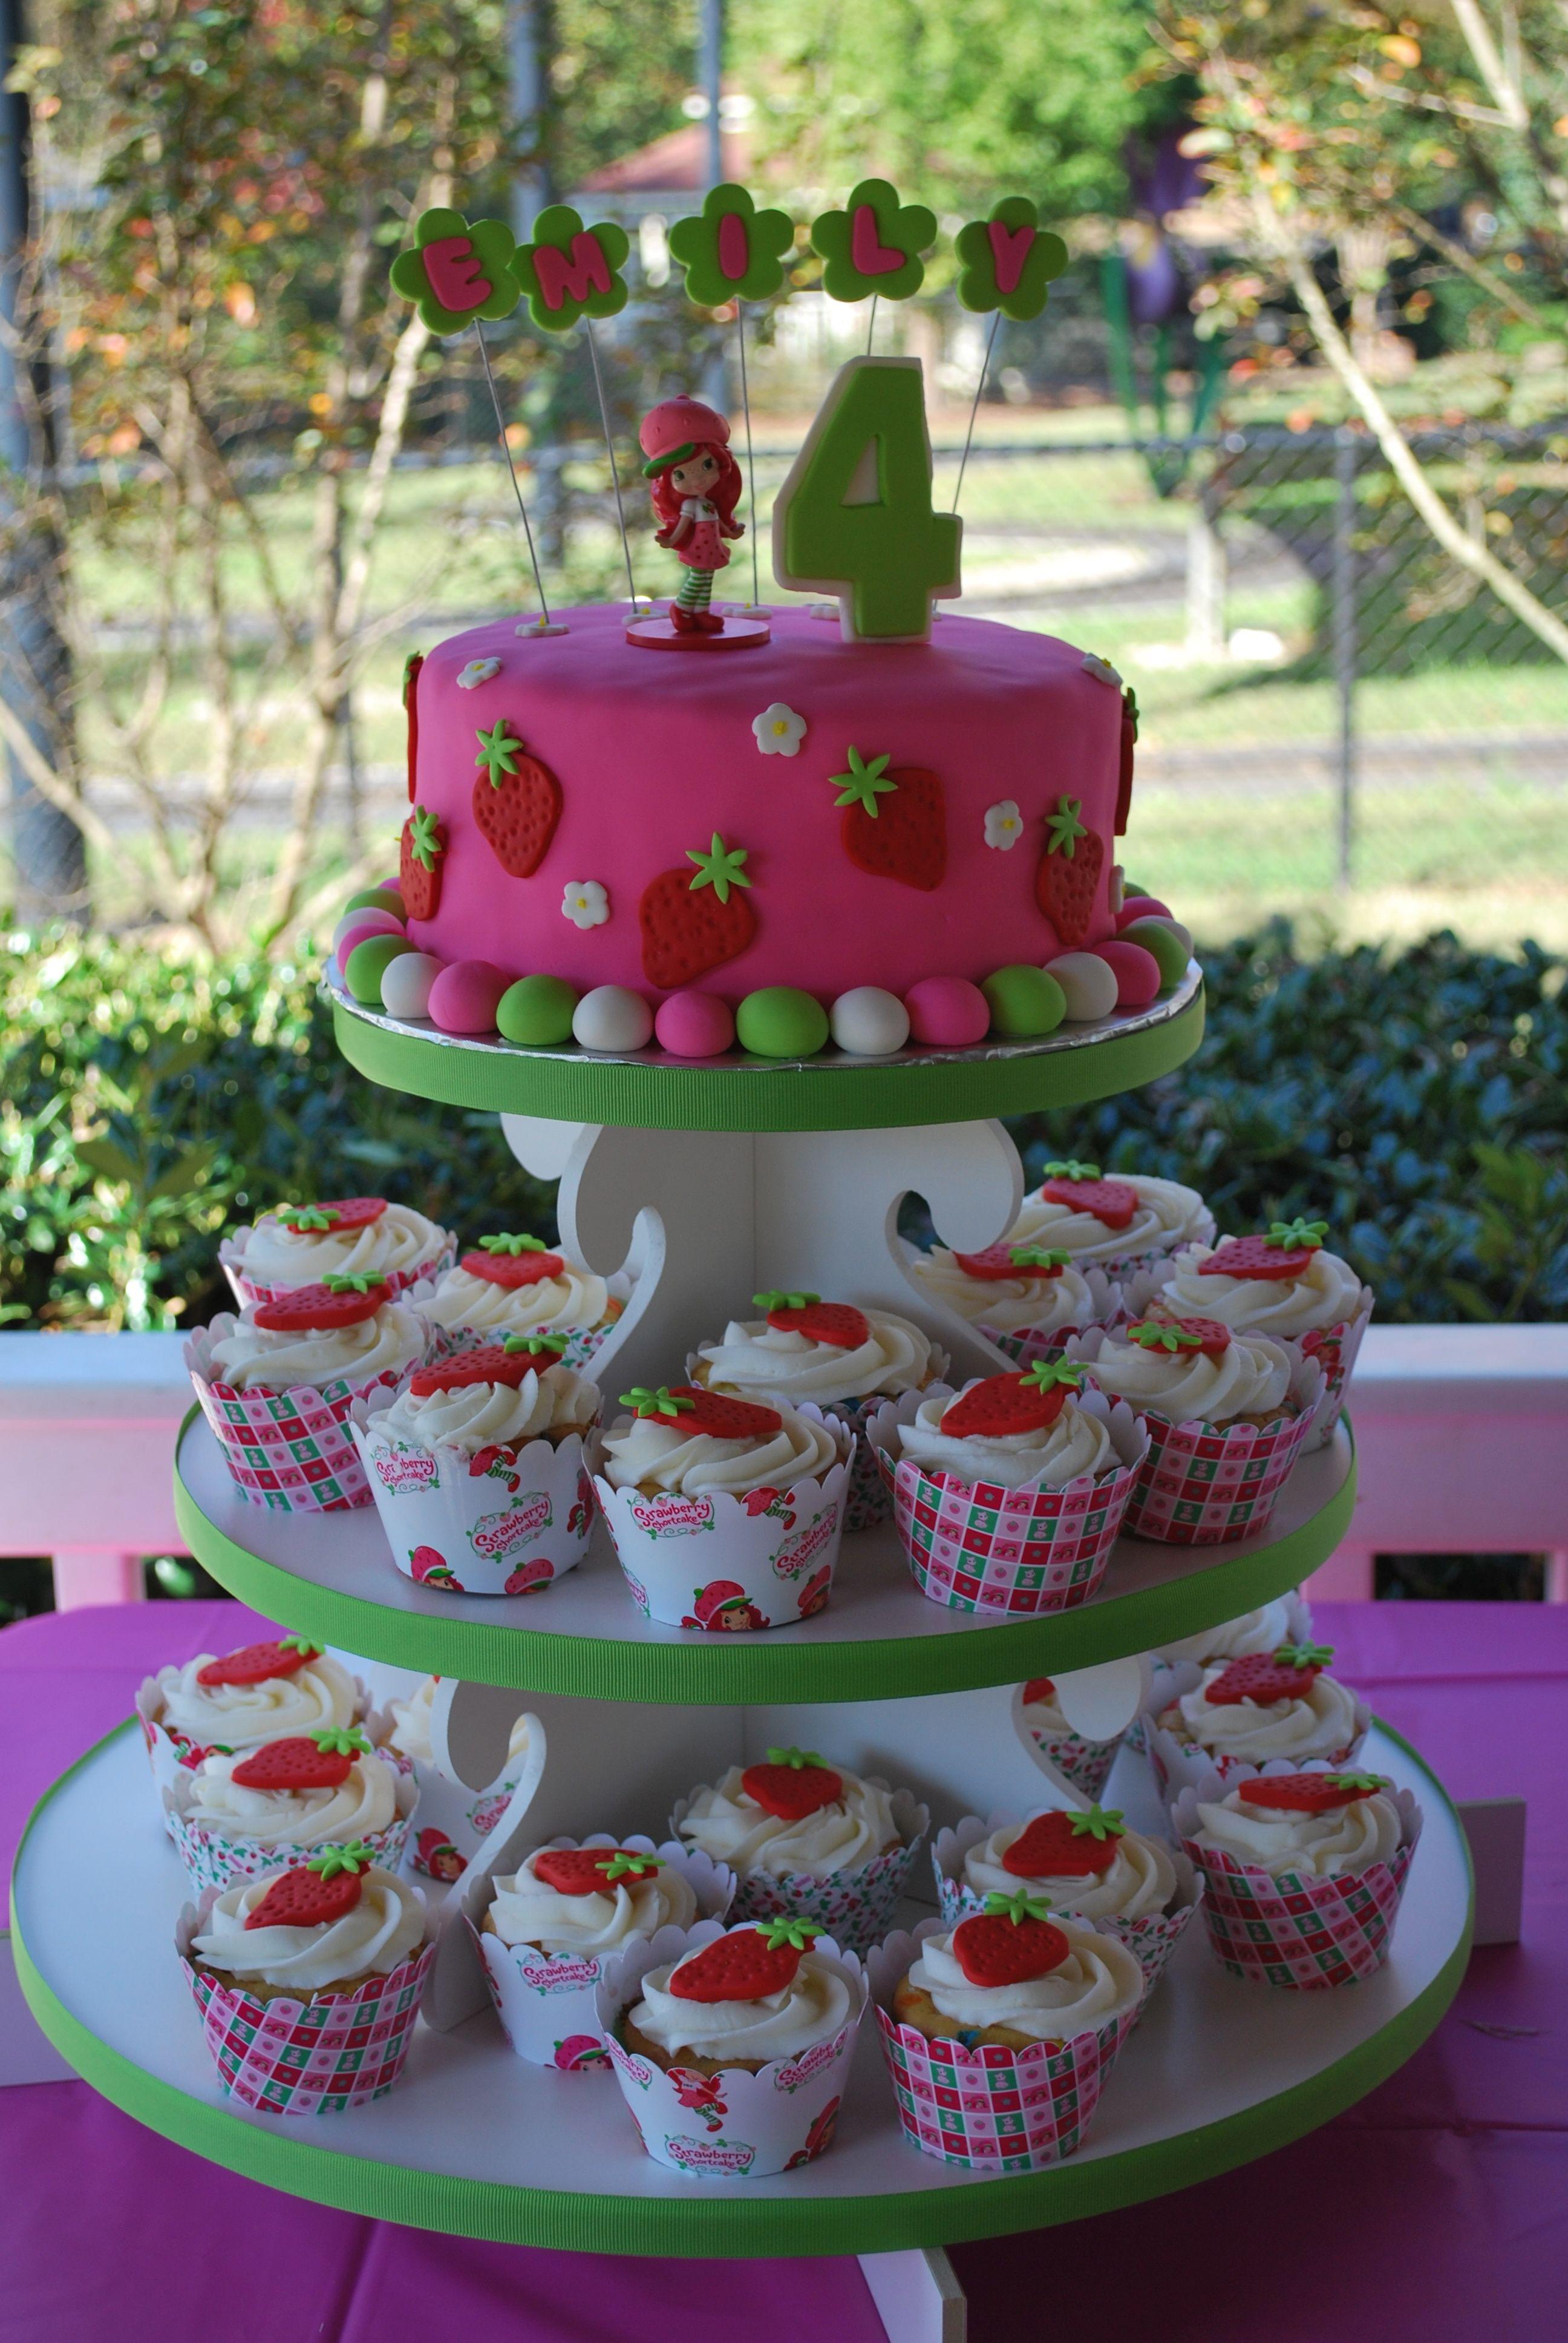 Strawberry shortcake cake and cupcakes